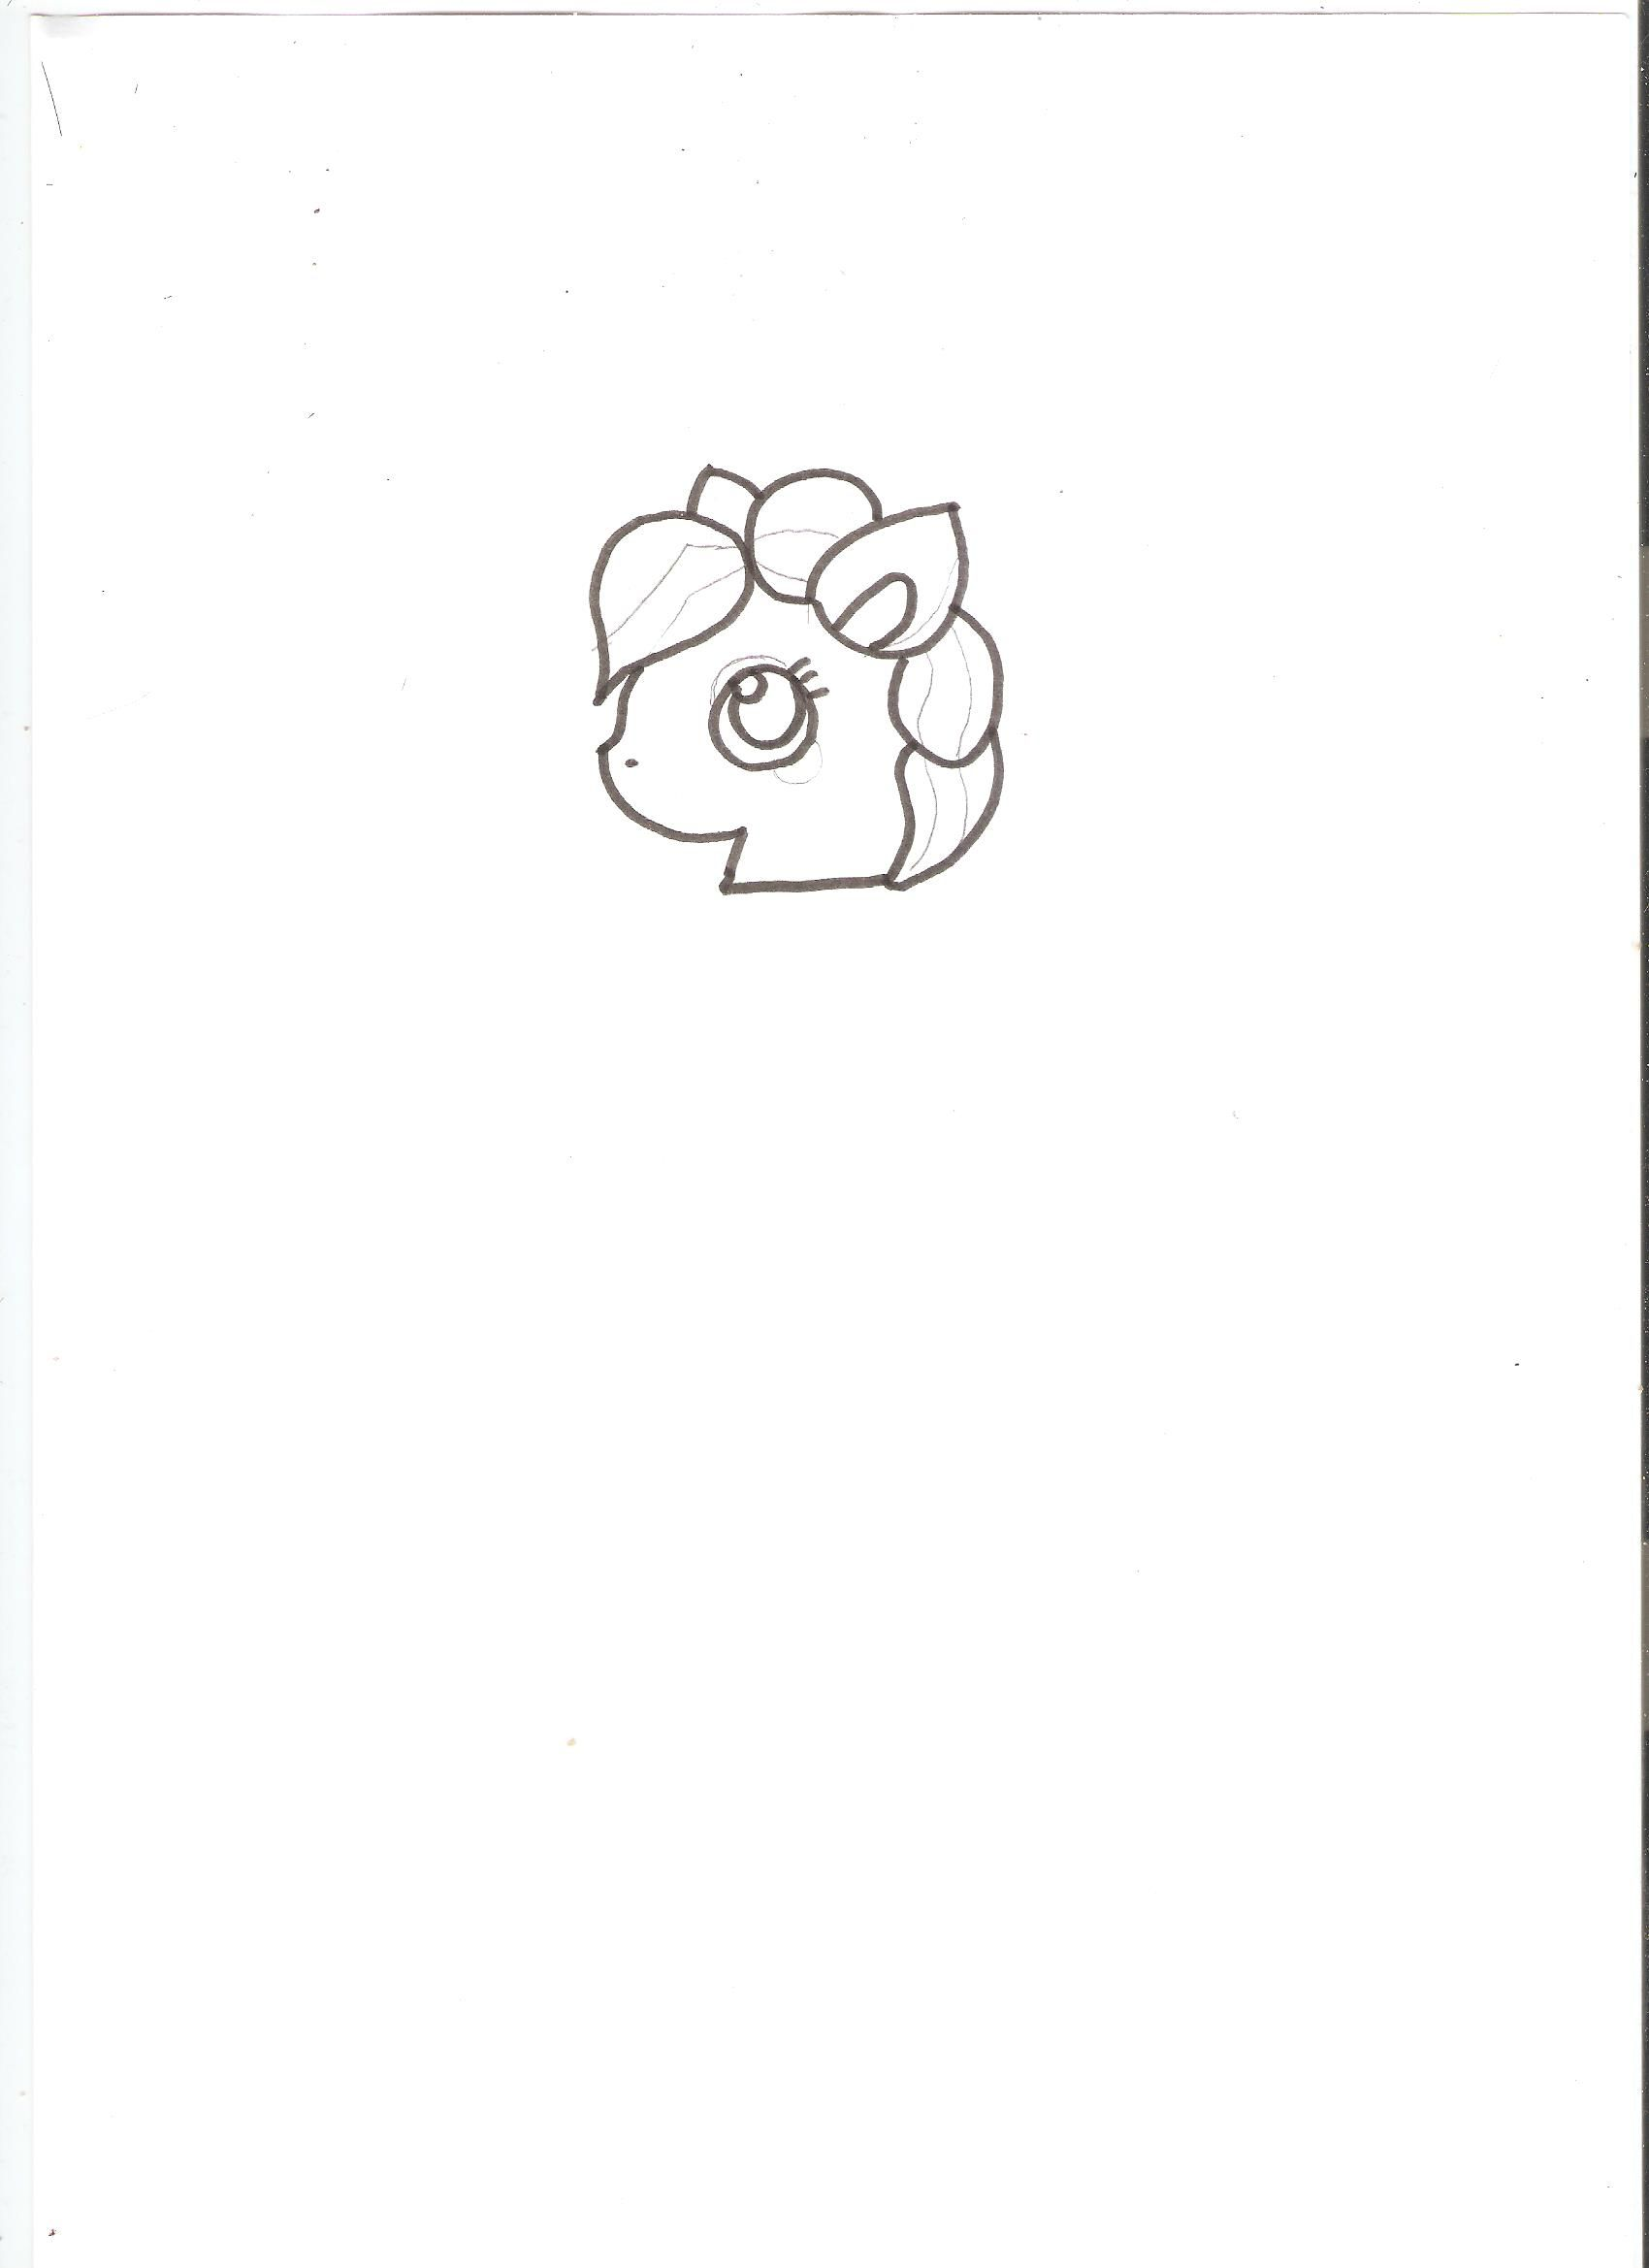 Plantilla separador libros unicornio kawaii YOUTUBE: maynterest ...